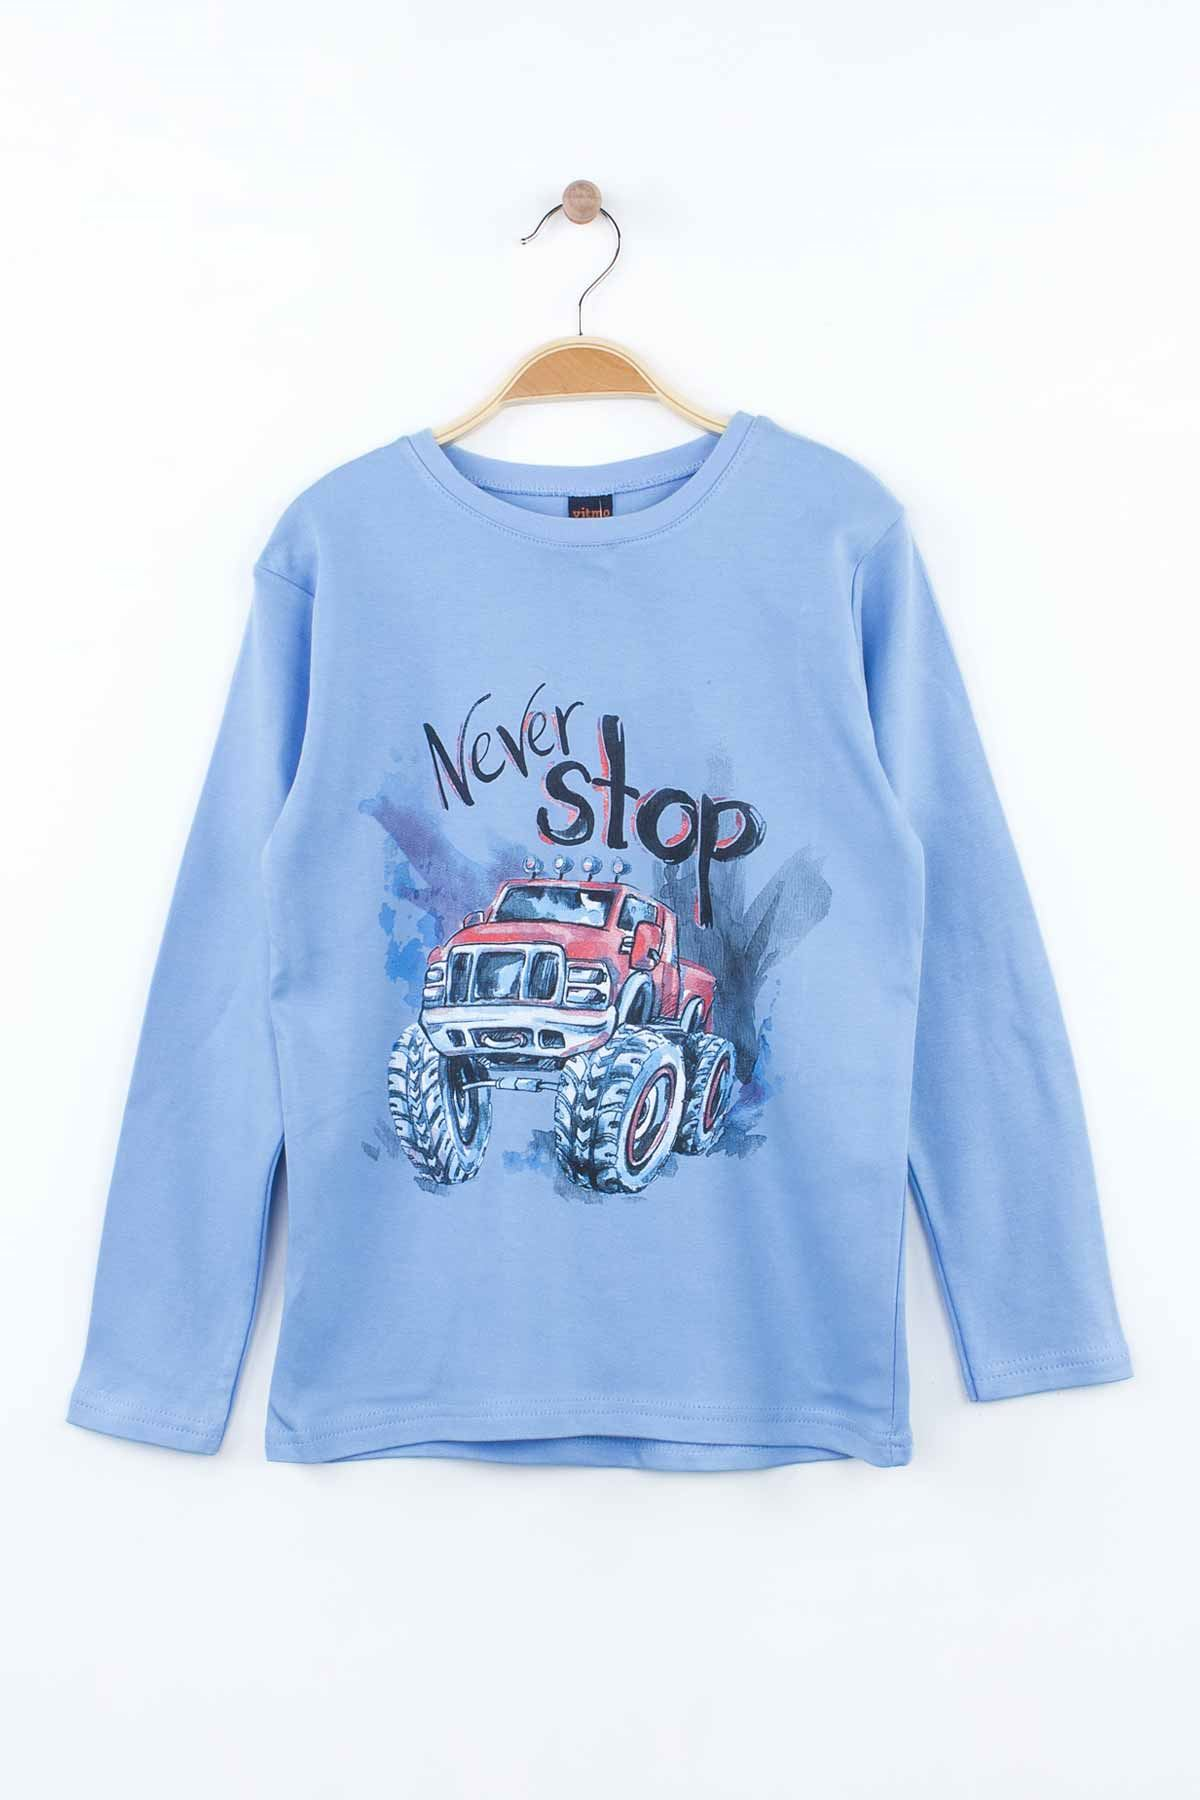 Blue Male Teenage Kids Pajama set Cottons Boys Children Daily Home Clothing Sleepwear Seasonal Printed Models